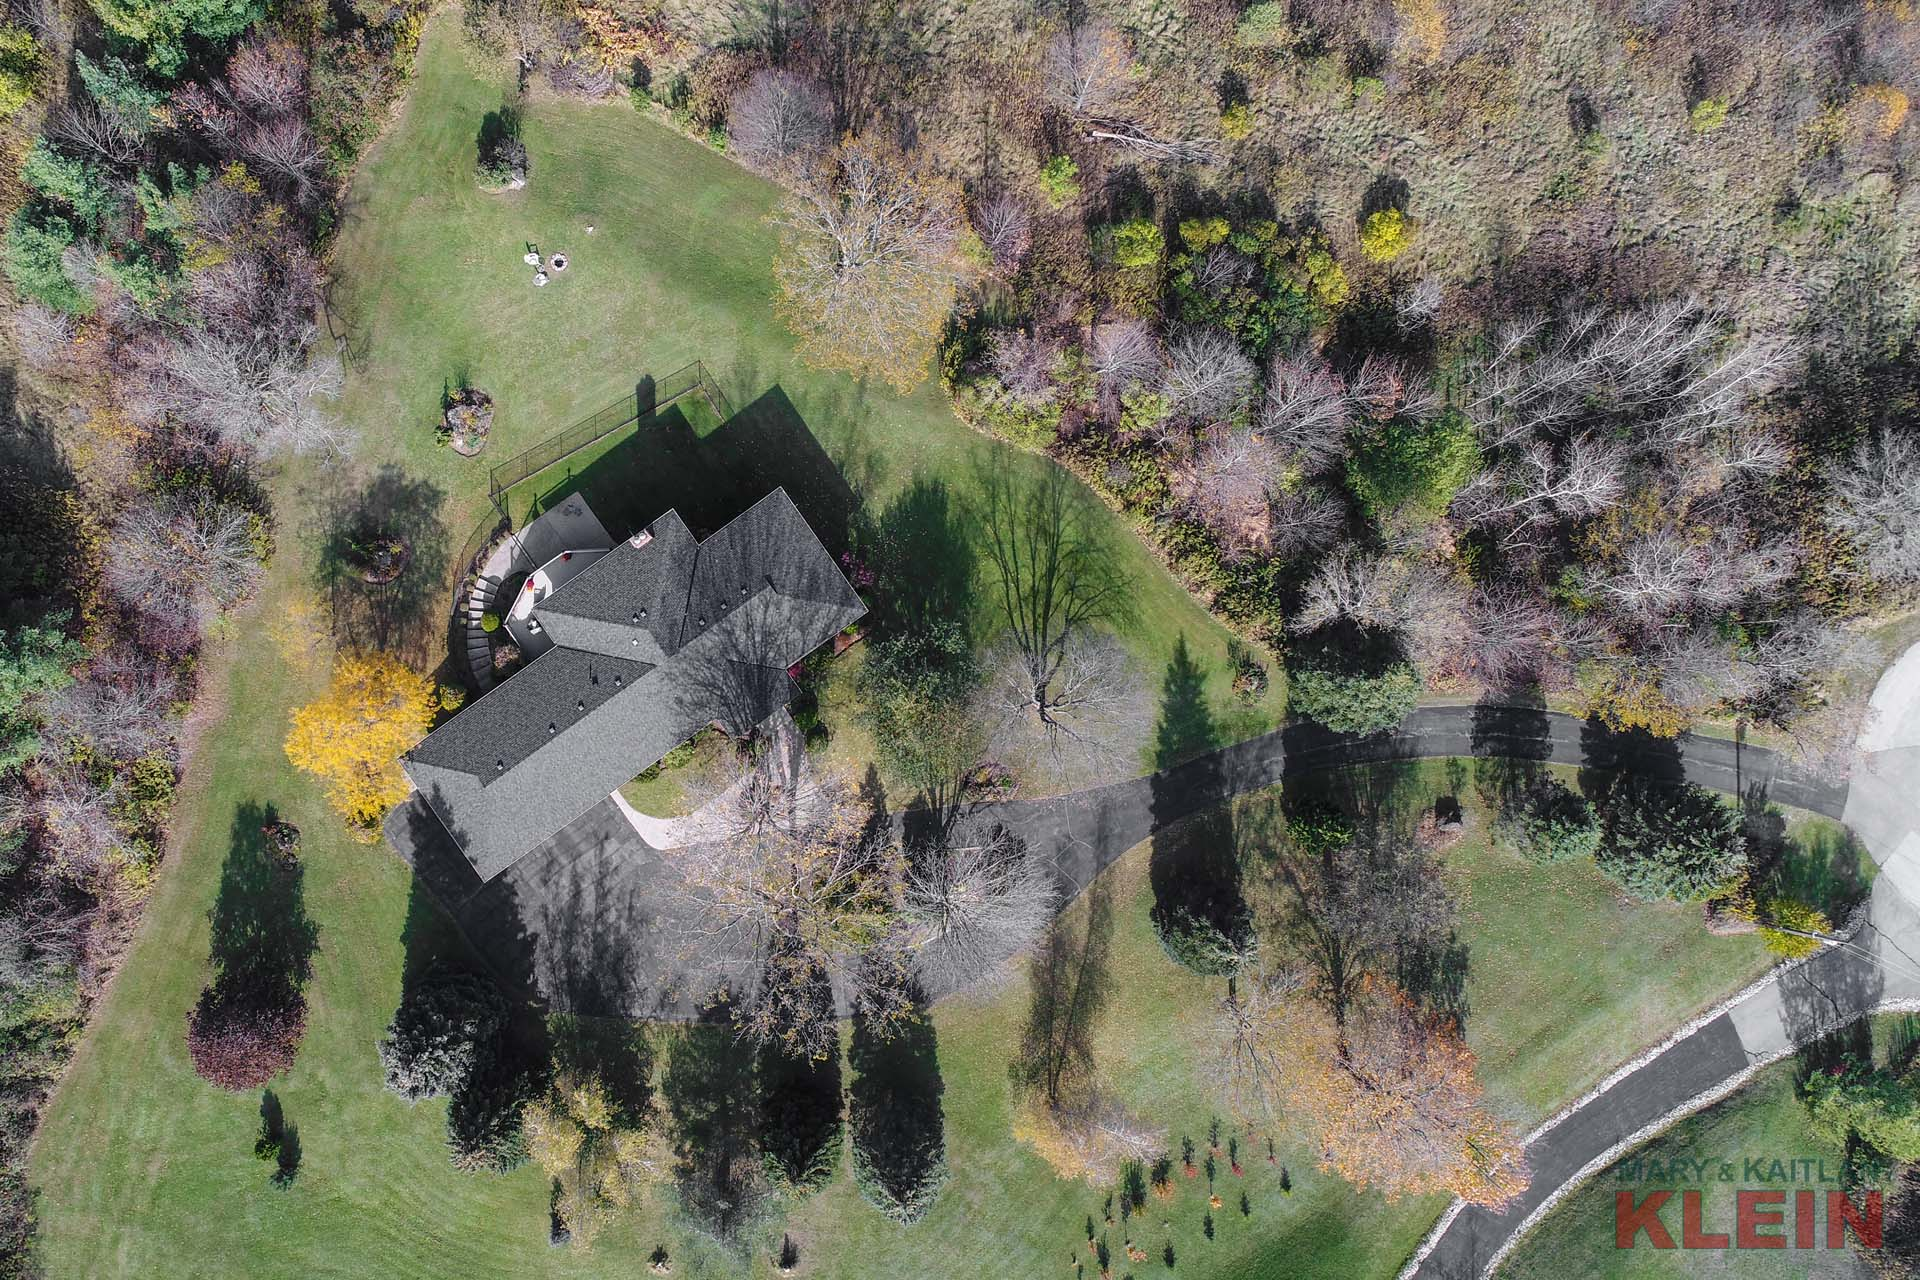 Home for sale, alton, caledon, near orangeville, cul de sac, private